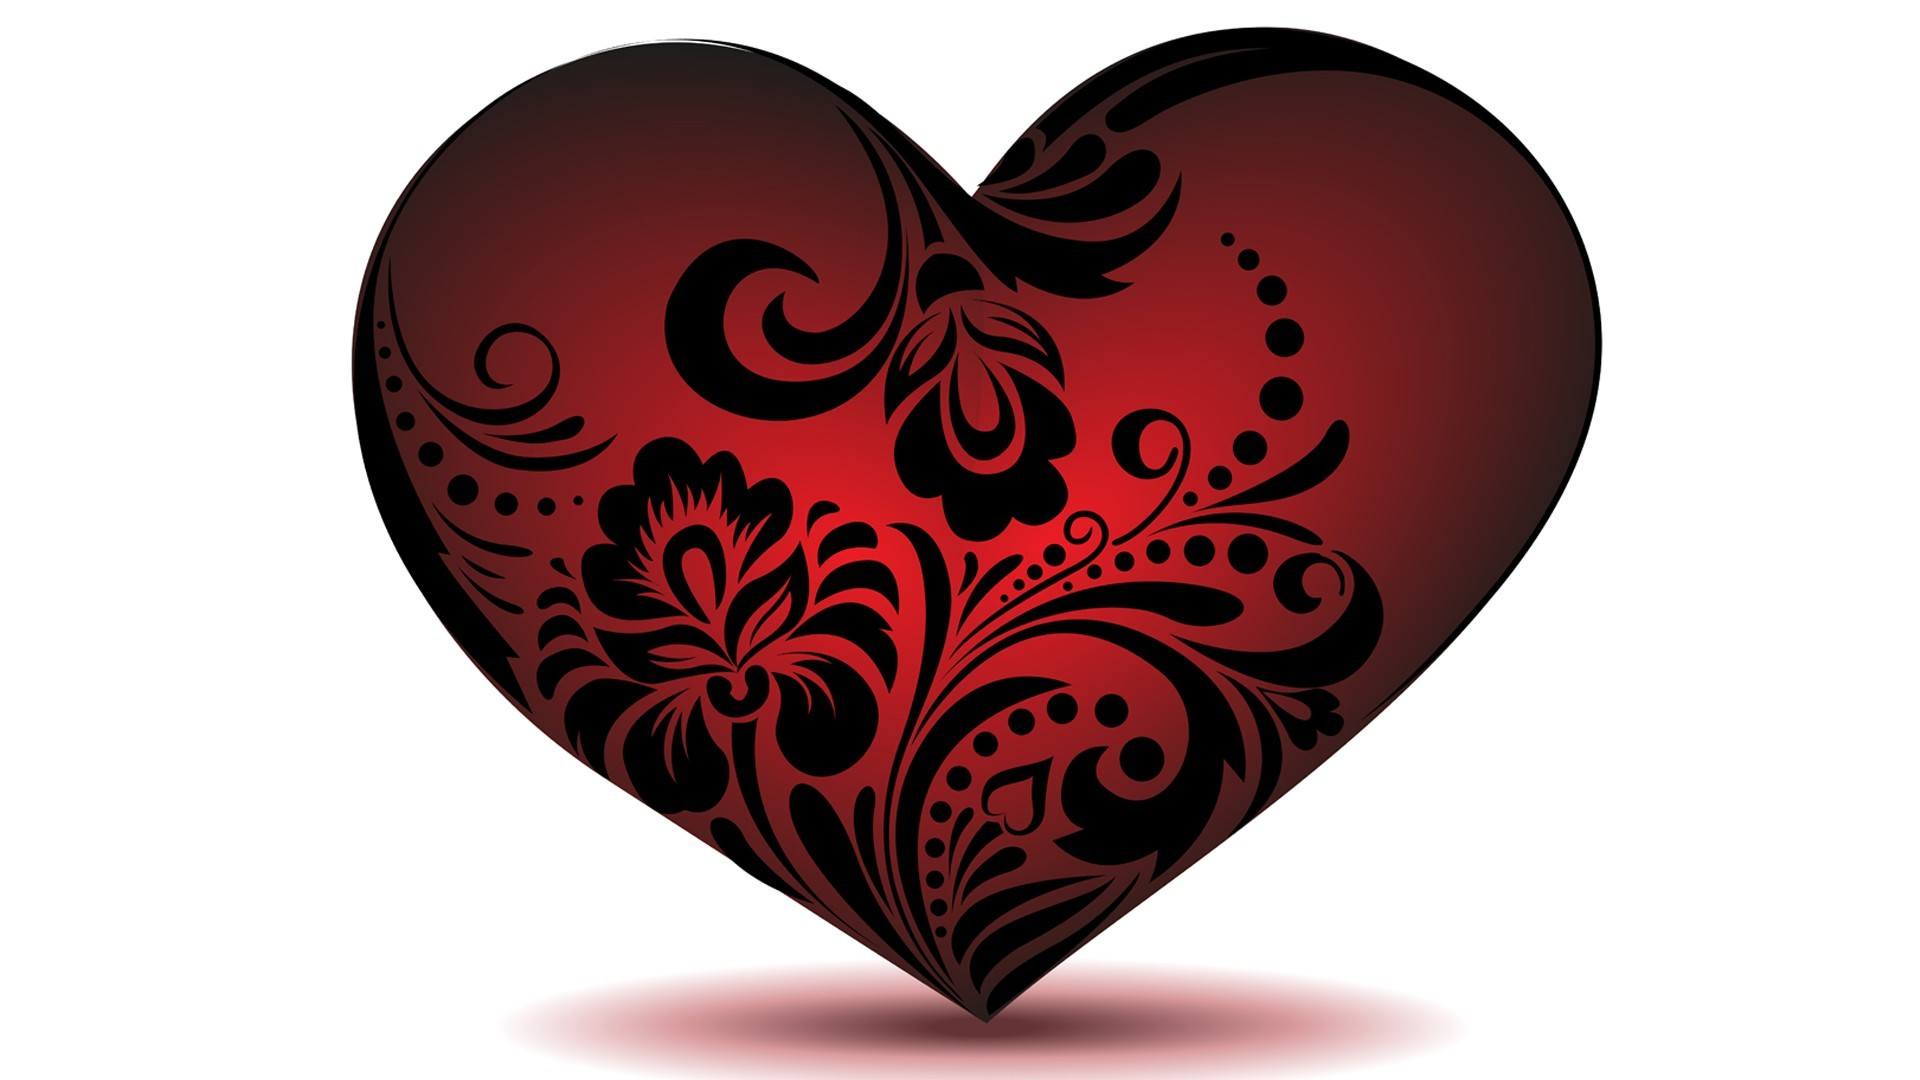 Roamntic Red Heart Hd Wallpaper Free   Data Src Red - Hd Photos Of Heart - HD Wallpaper